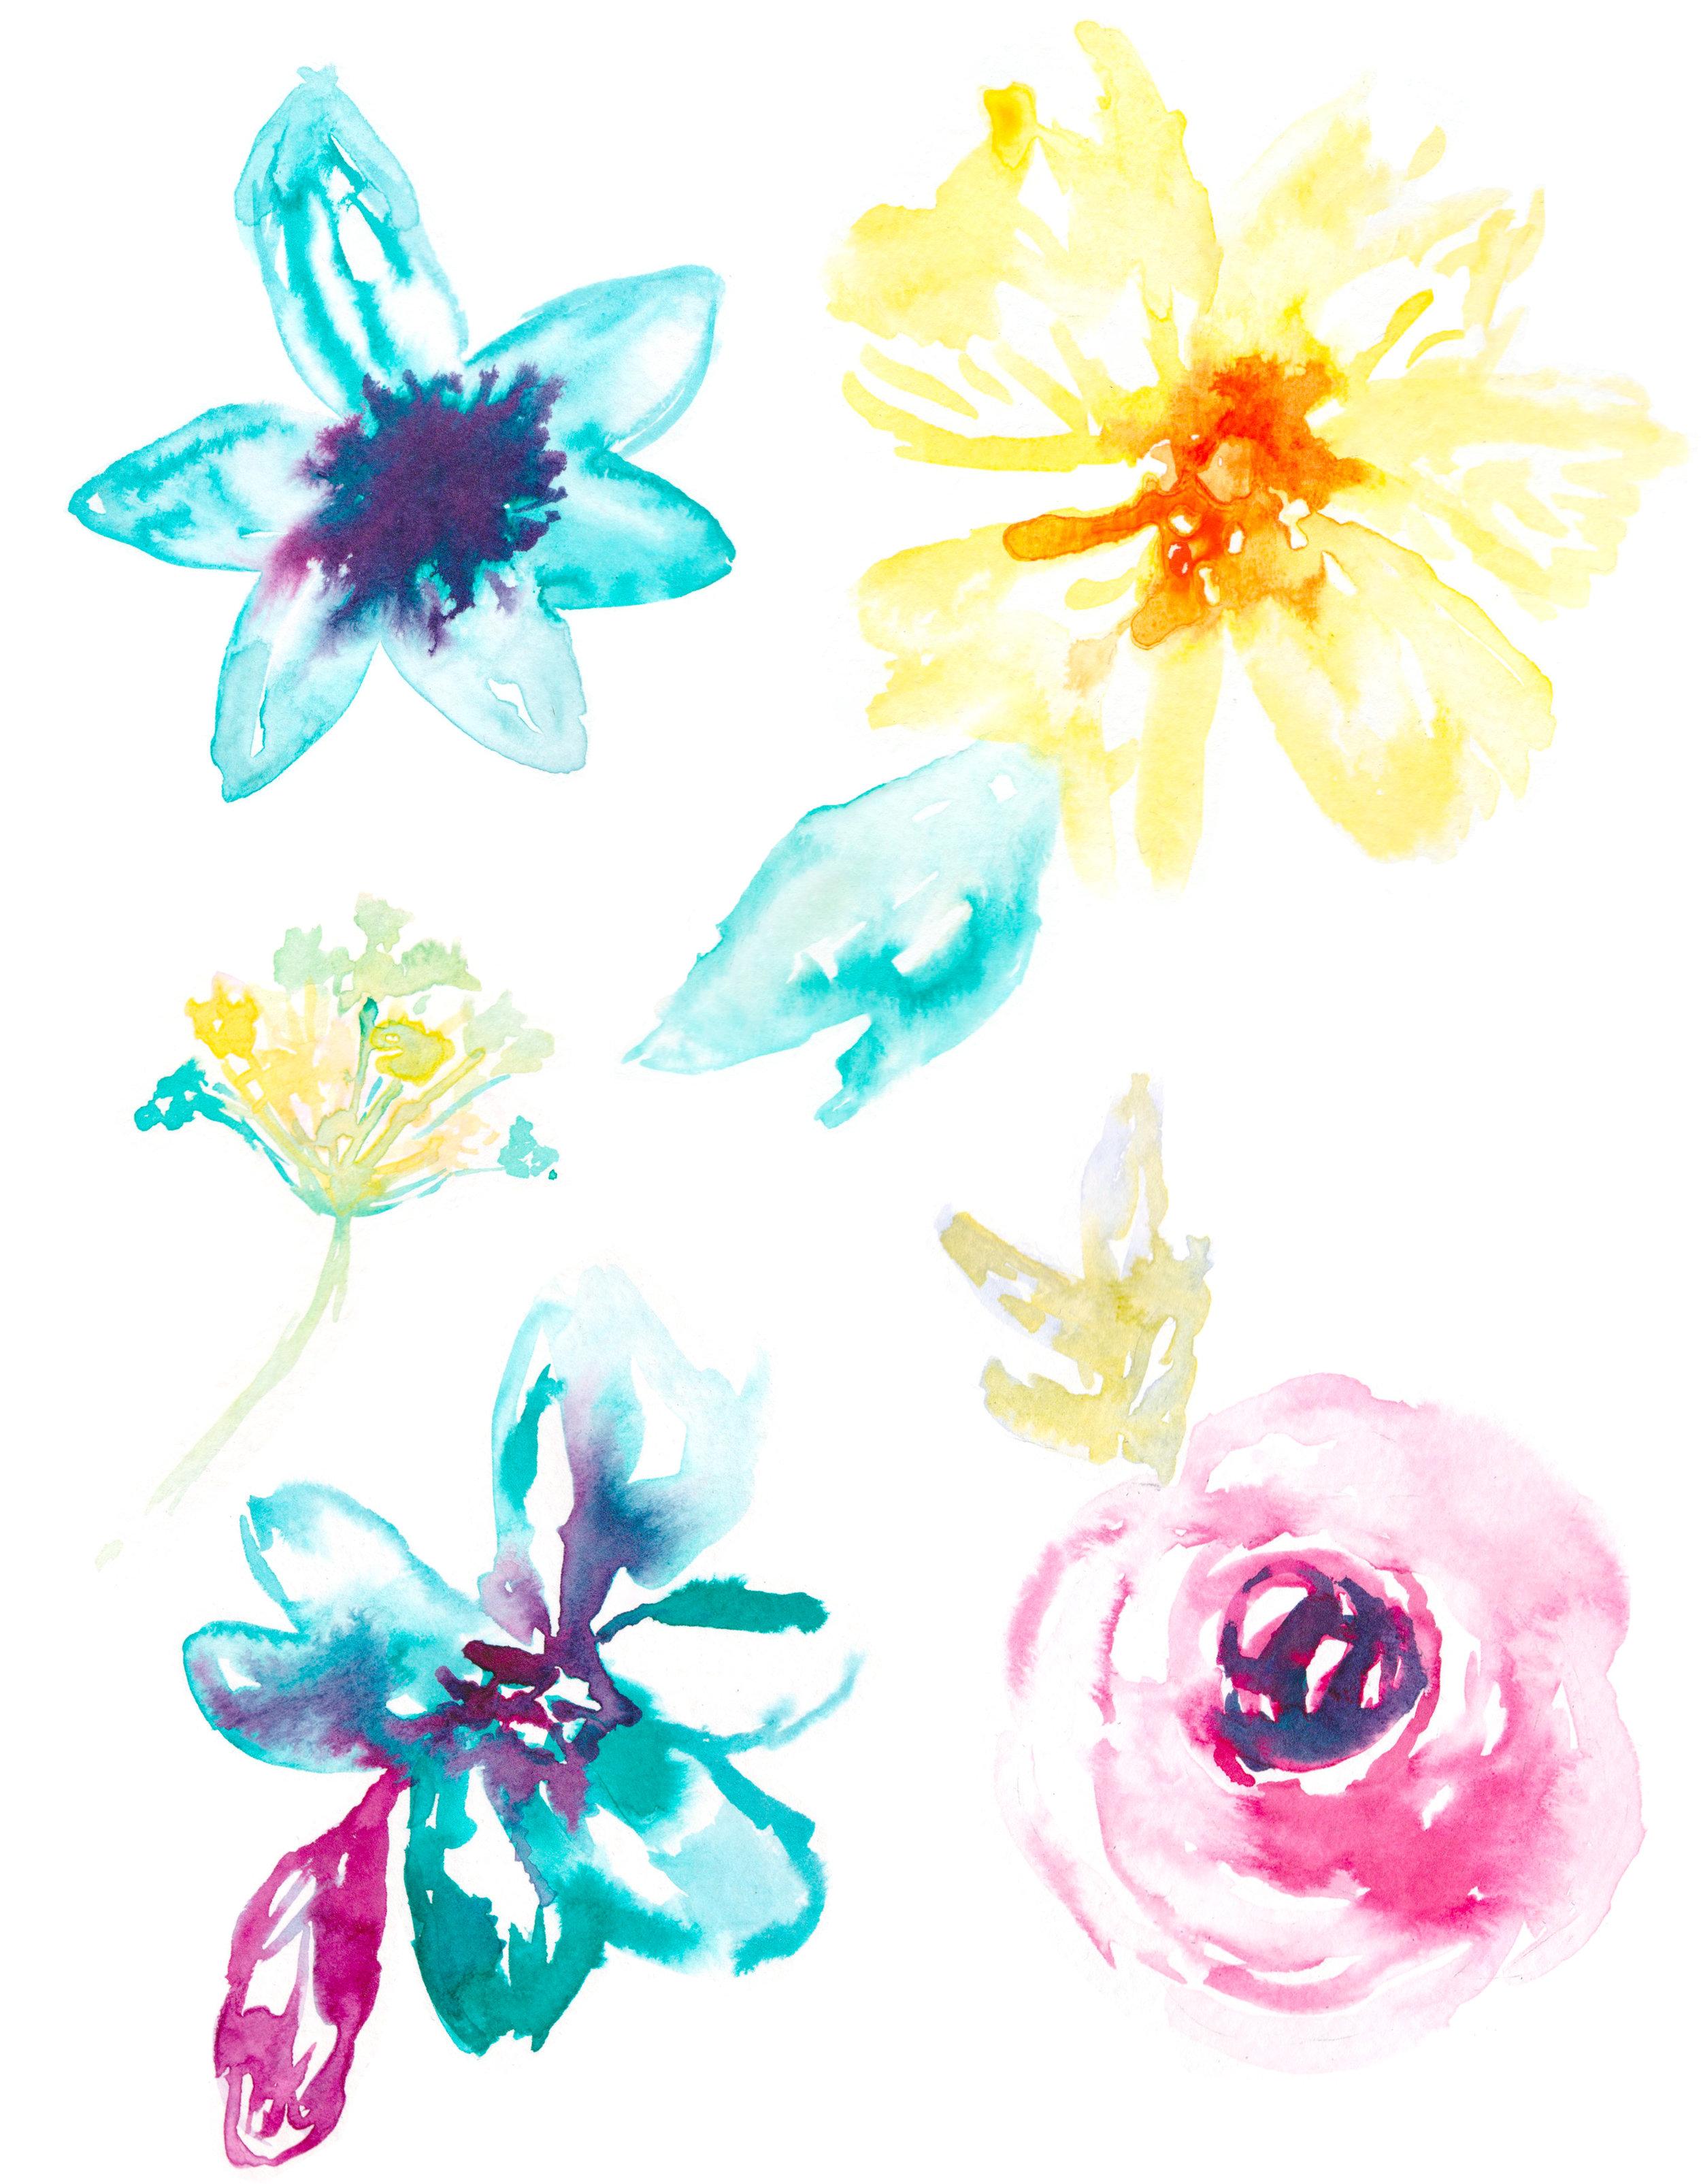 watercolor floral samples.jpg